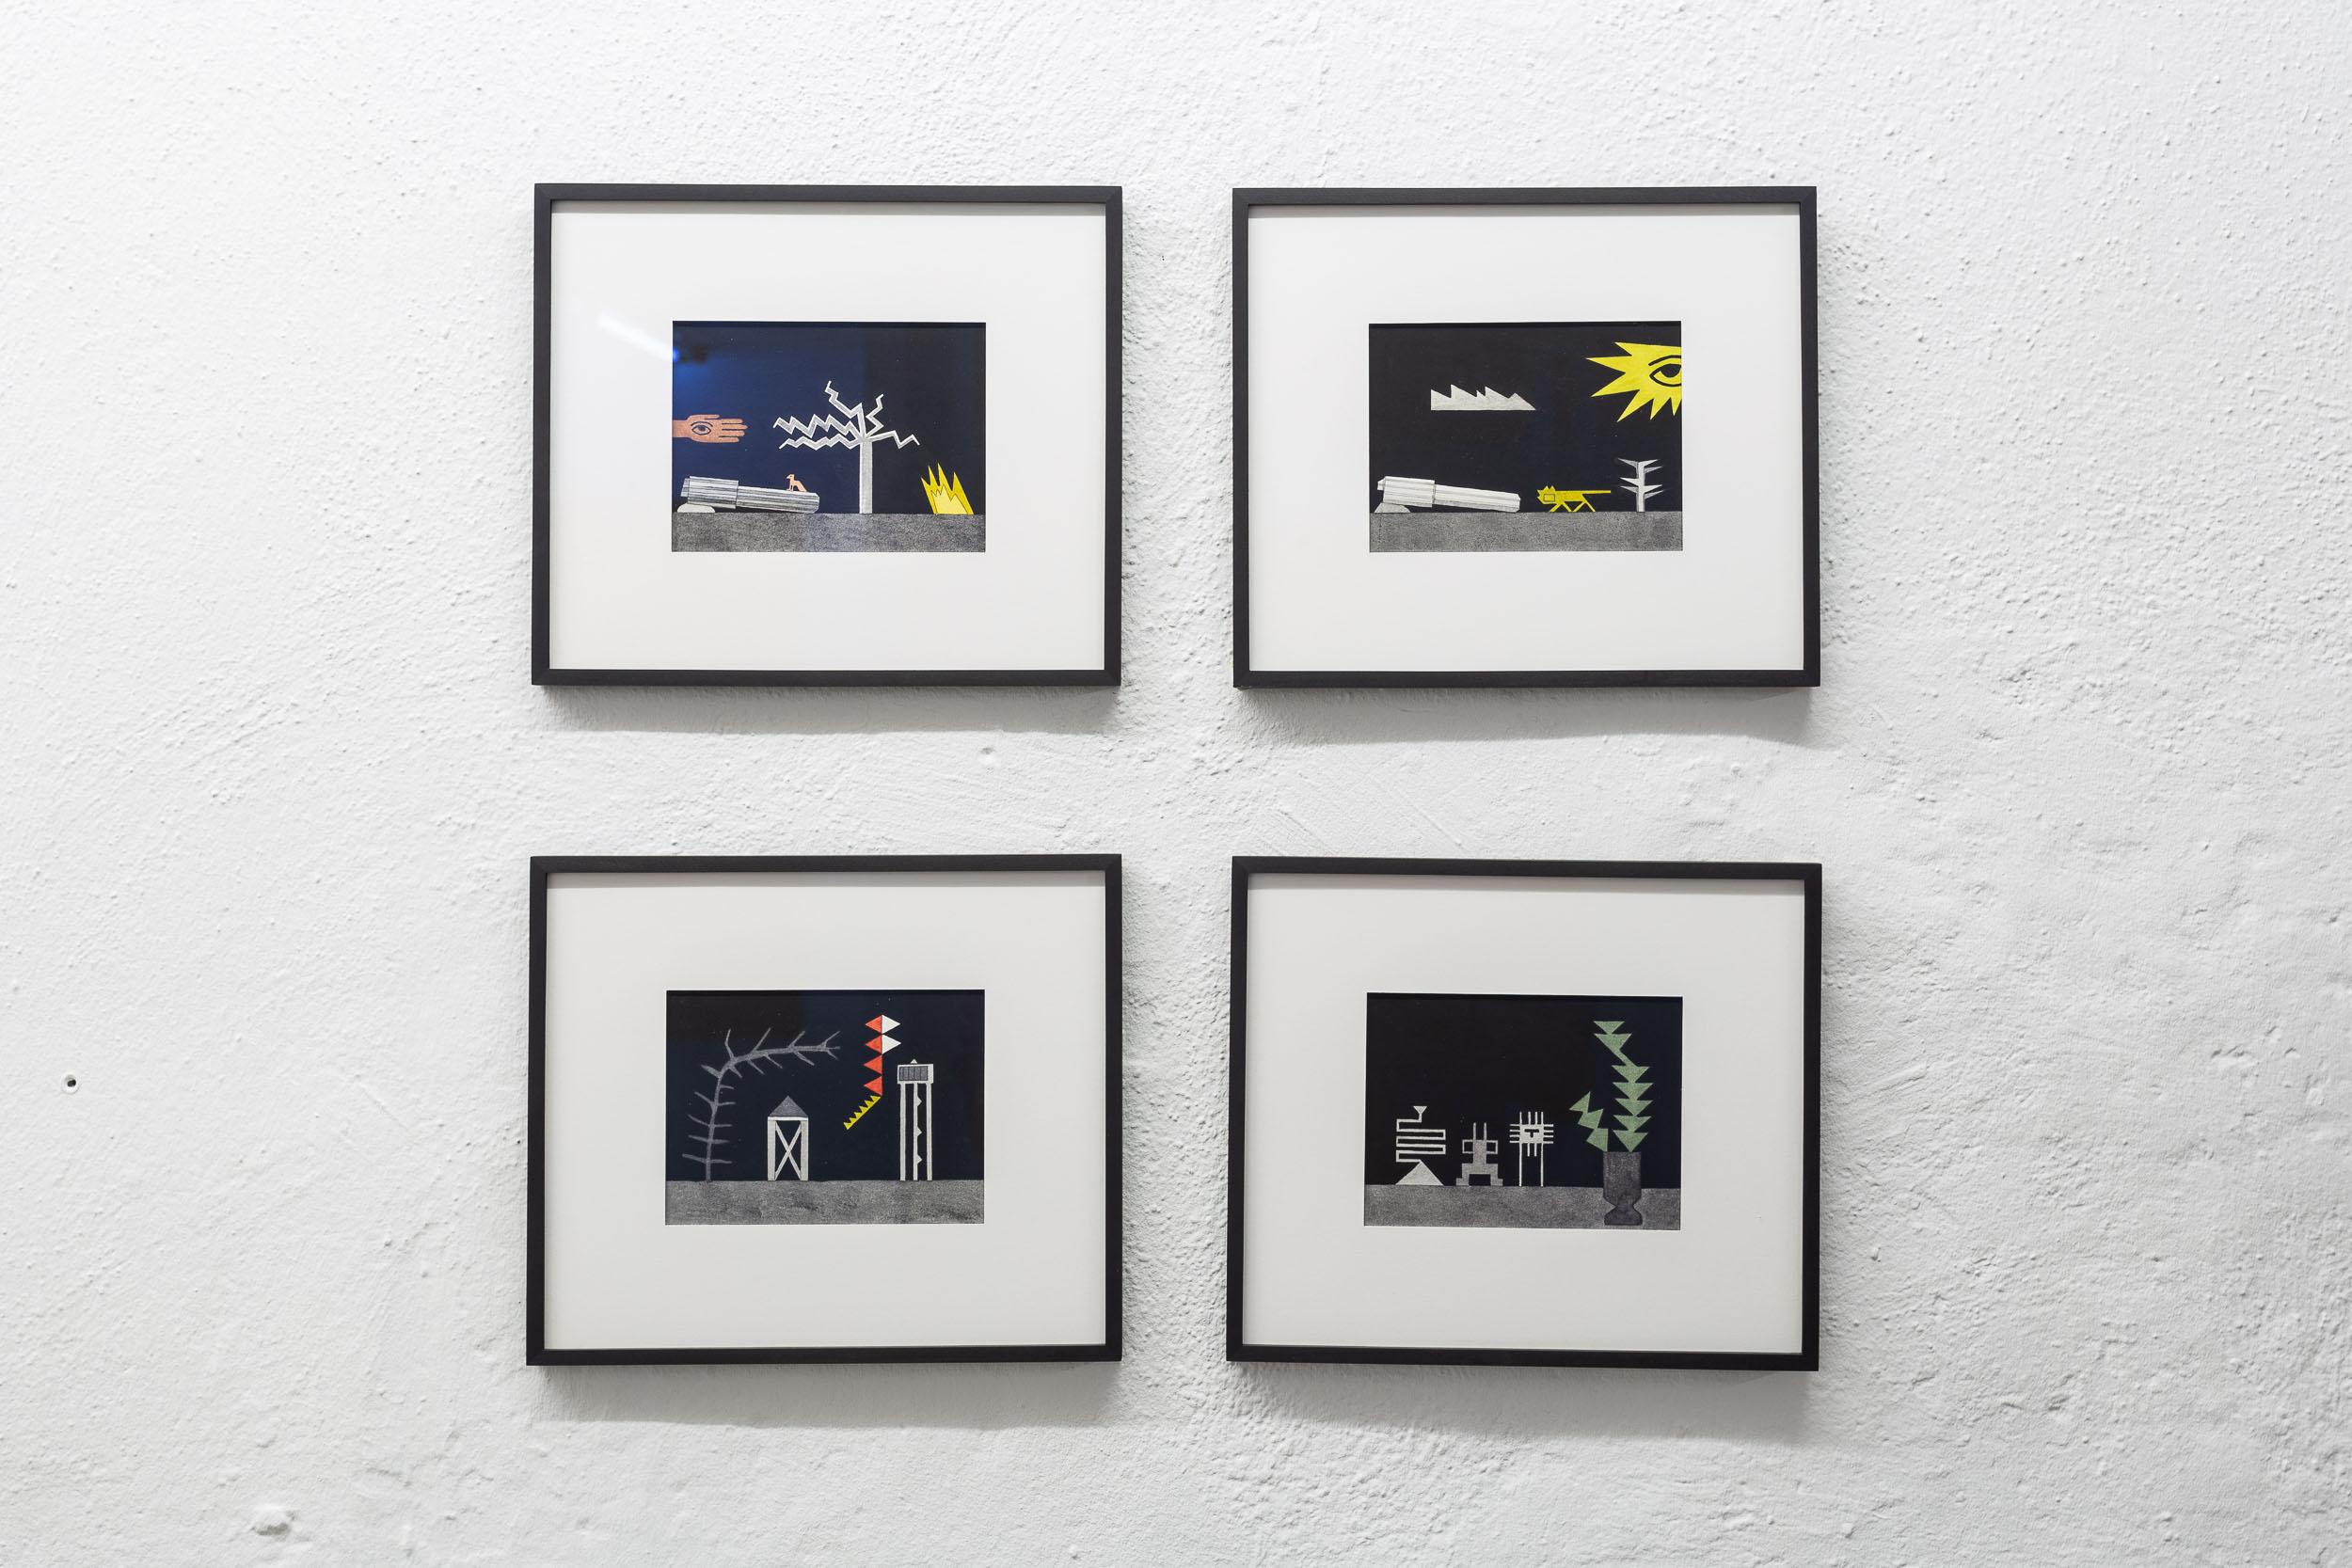 Patricia Bucher,  Untitled  (series), 2018, aquarelle and linoprint on paper, each 20.9 x 28.2 cm  Photo: Kilian Bannwart